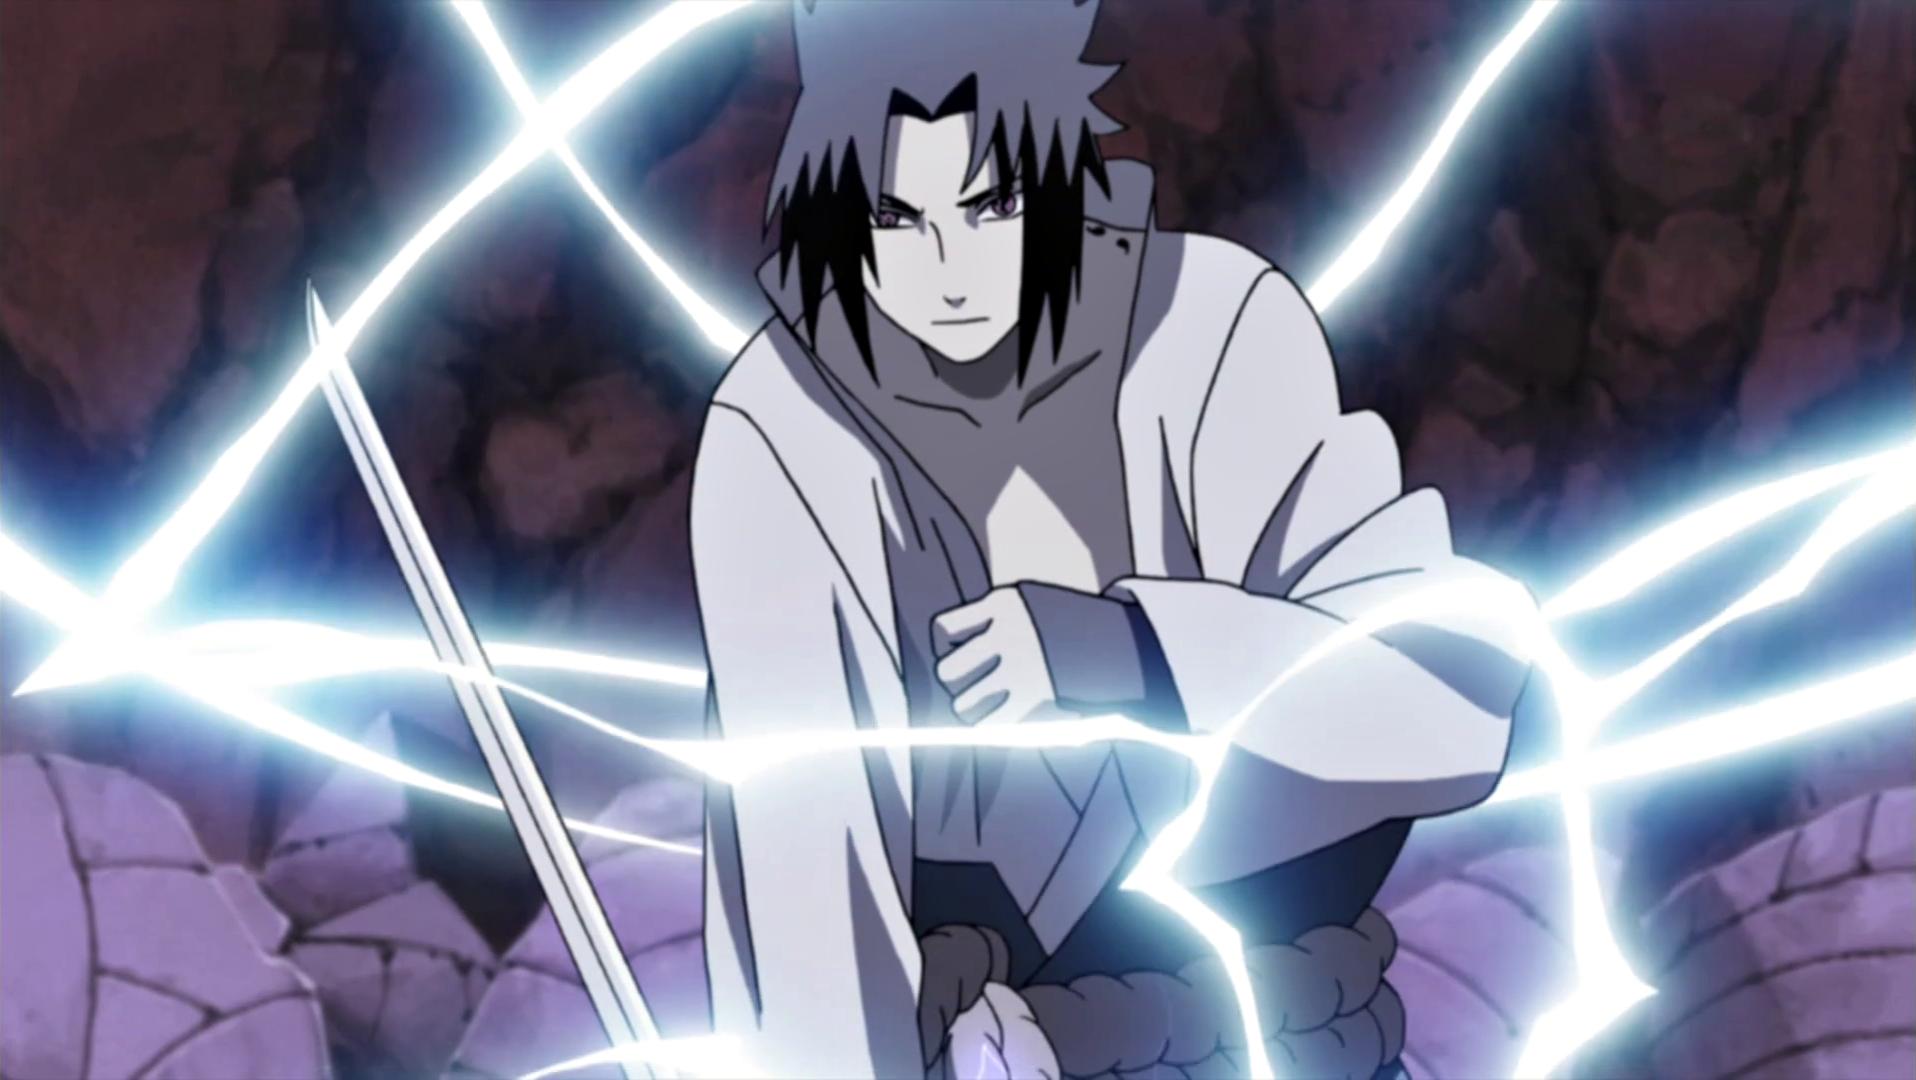 Chidori Current | Narutopedia | Fandom powered by Wikia